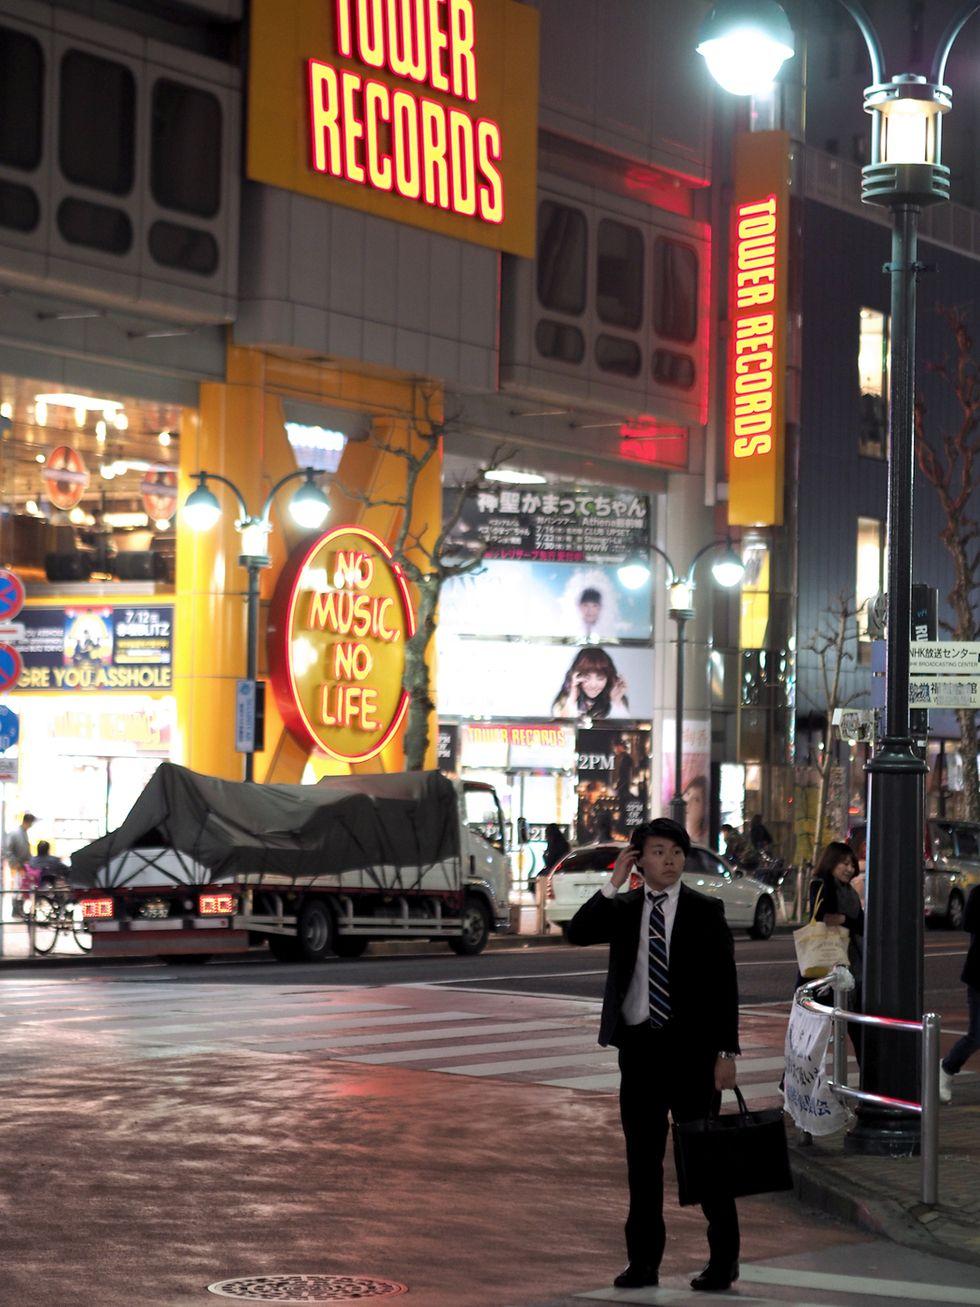 Ensimmäinen ilta Tokiossa | City lights of Tokyo, Shibuya & Harajuku - Pupulandia | Lily.fi